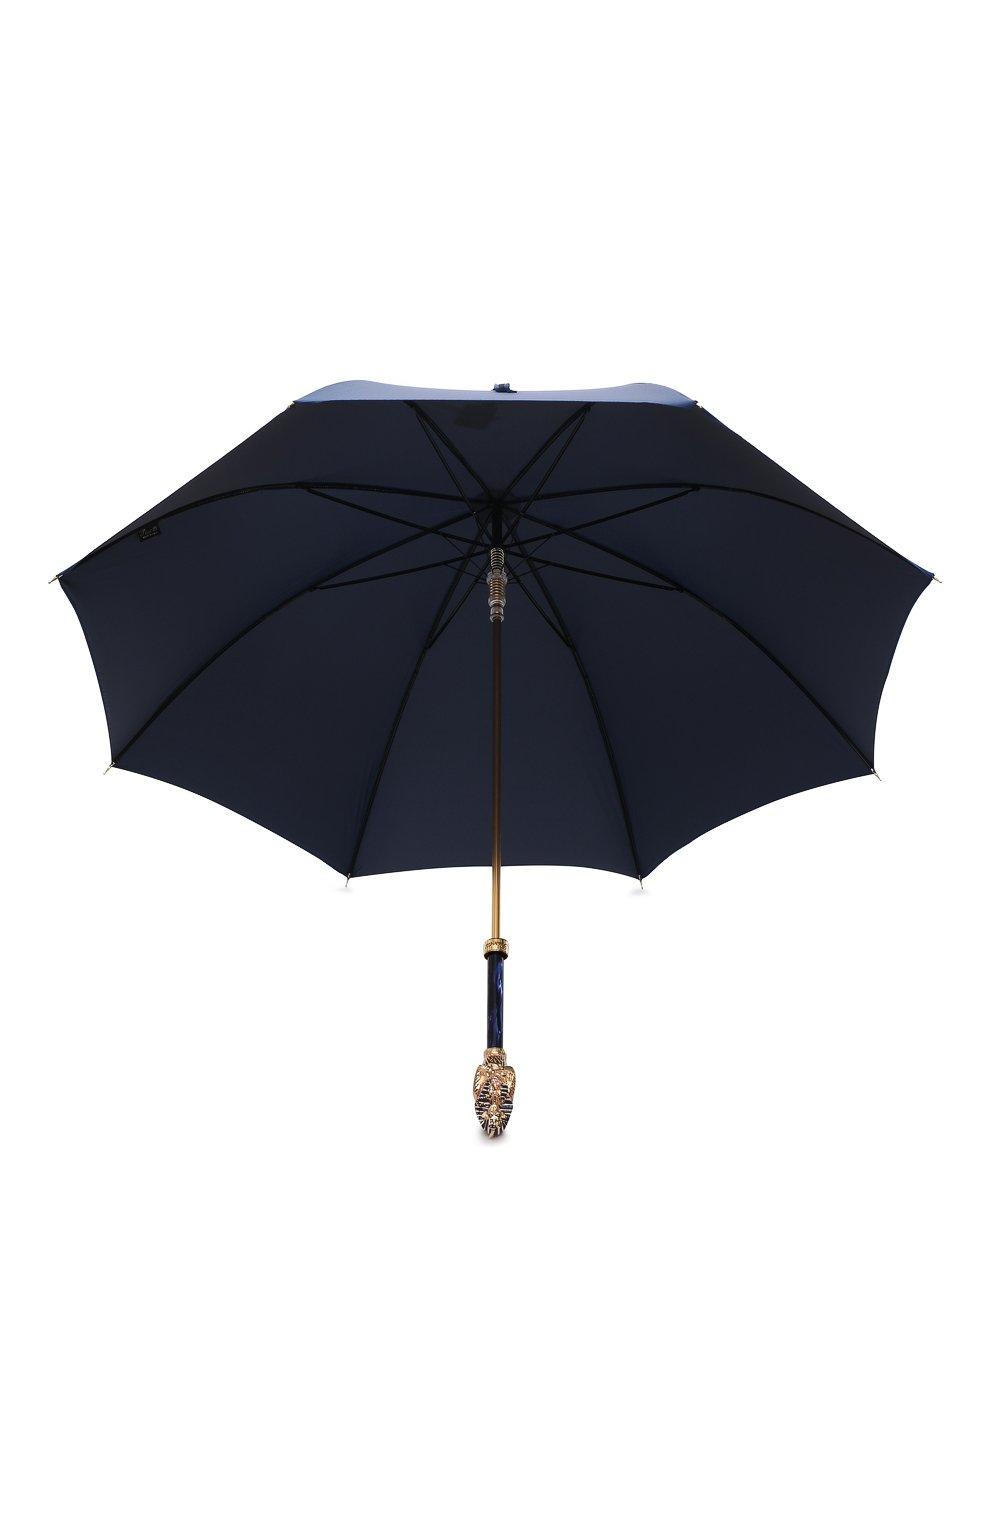 Мужской зонт-трость PASOTTI OMBRELLI темно-синего цвета, арт. 479/RAS0 0XF0RD/8/K68 | Фото 3 (Материал: Текстиль, Синтетический материал, Металл)